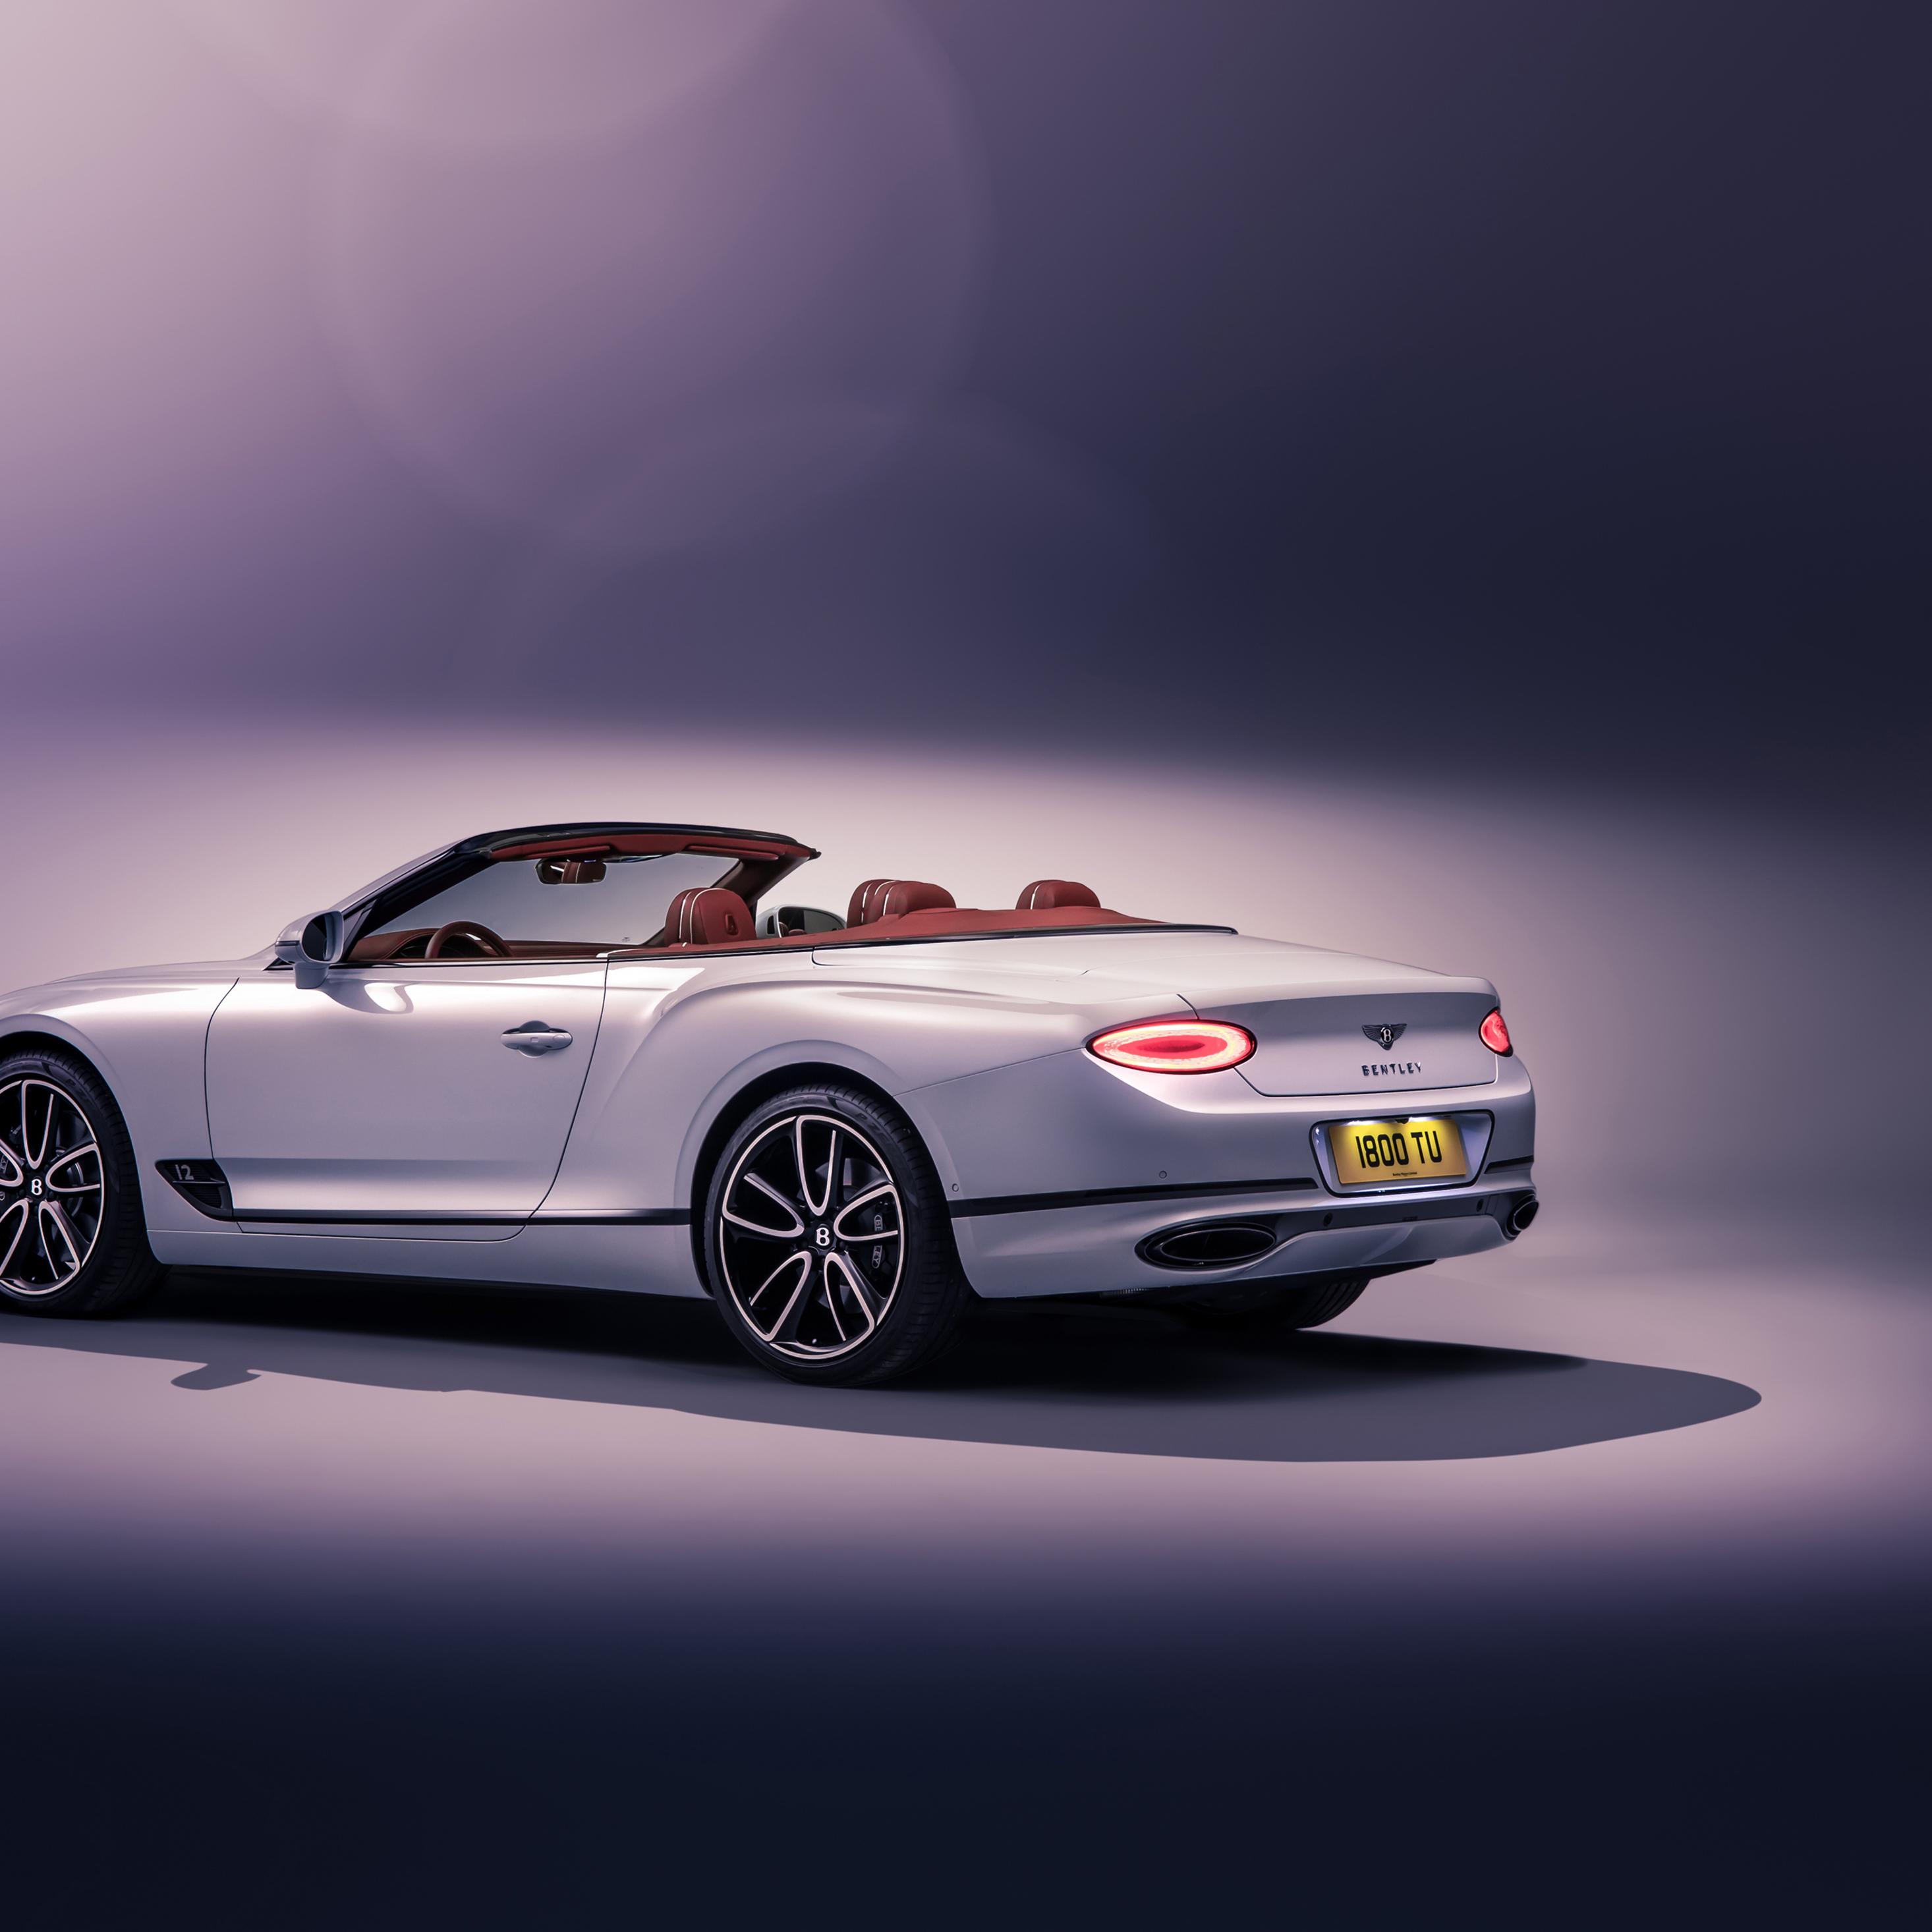 bentley-continental-gt-convertible-2019-rear-eb.jpg